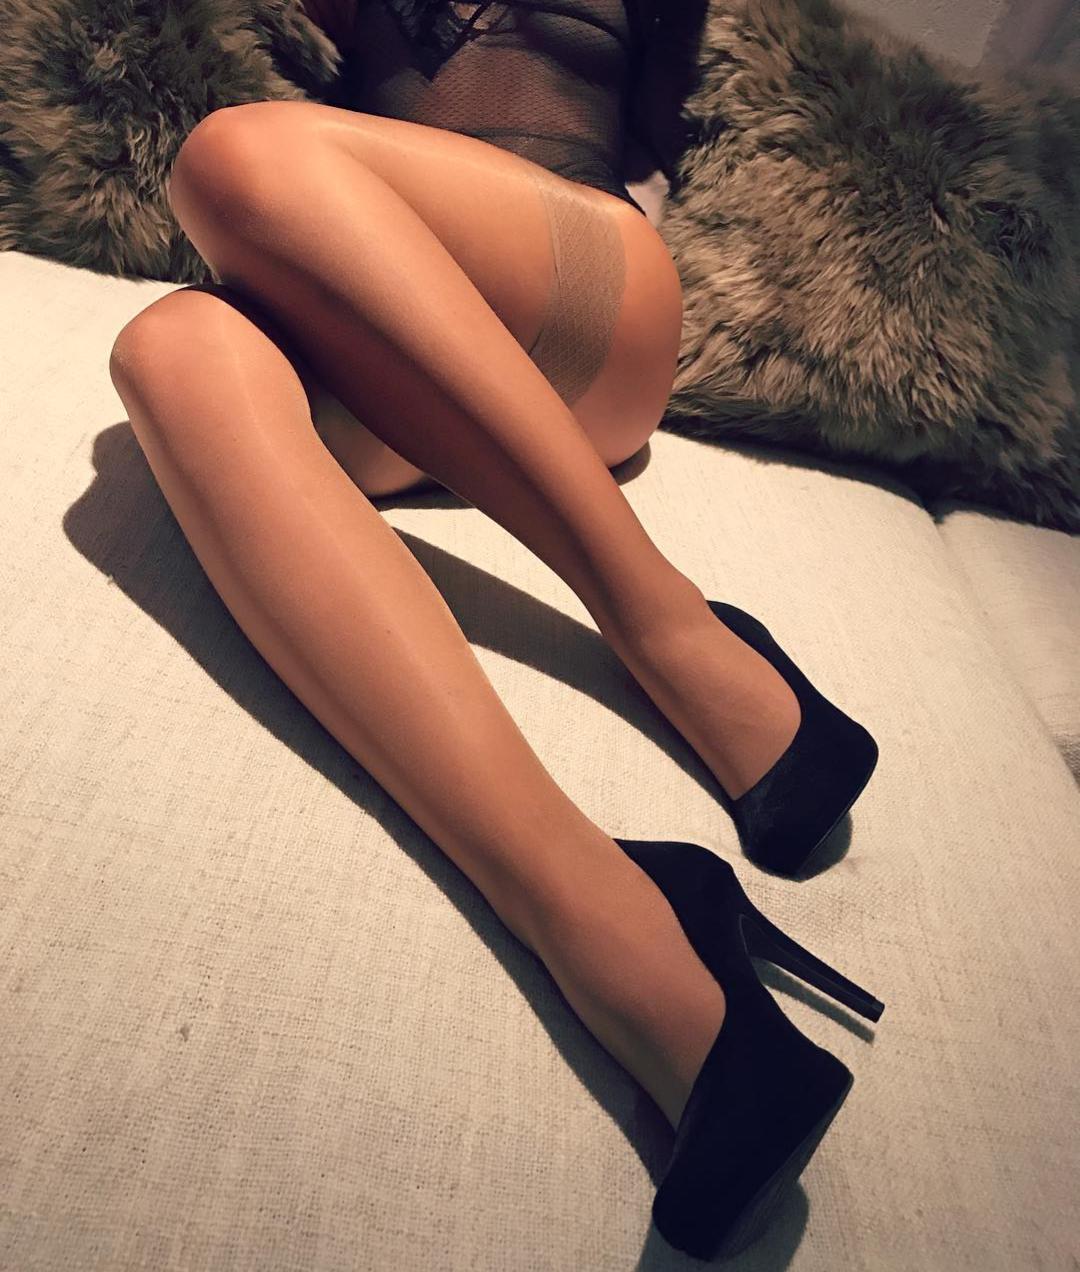 Pin on Pantyhose tan beige brown nude nylons tights